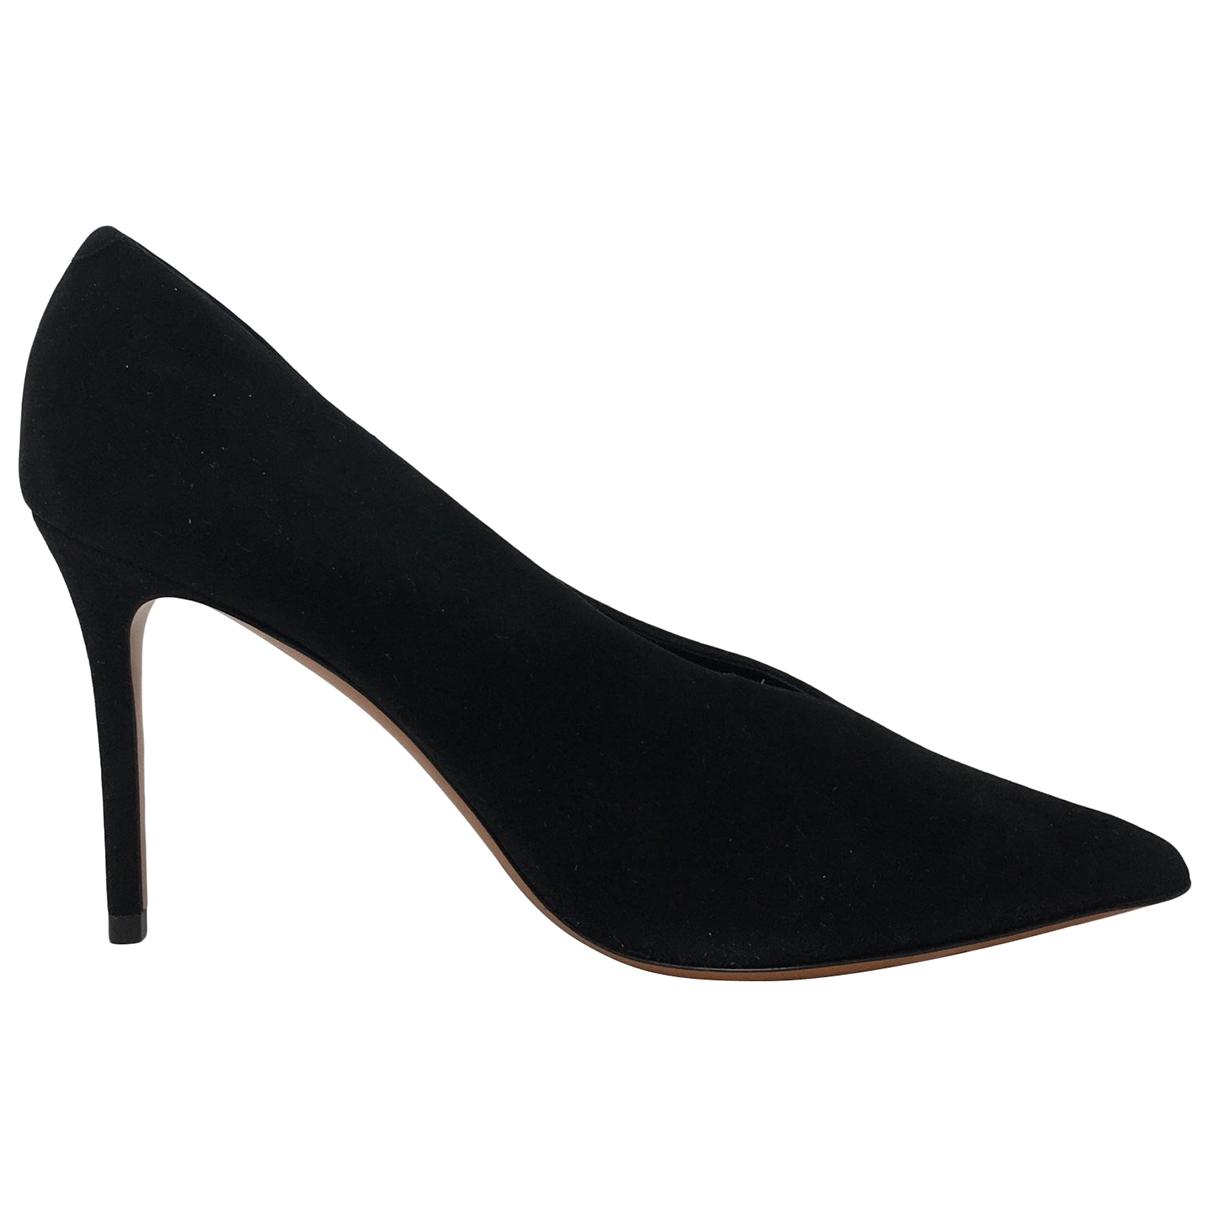 Celine \N Black Suede Heels for Women 38 EU